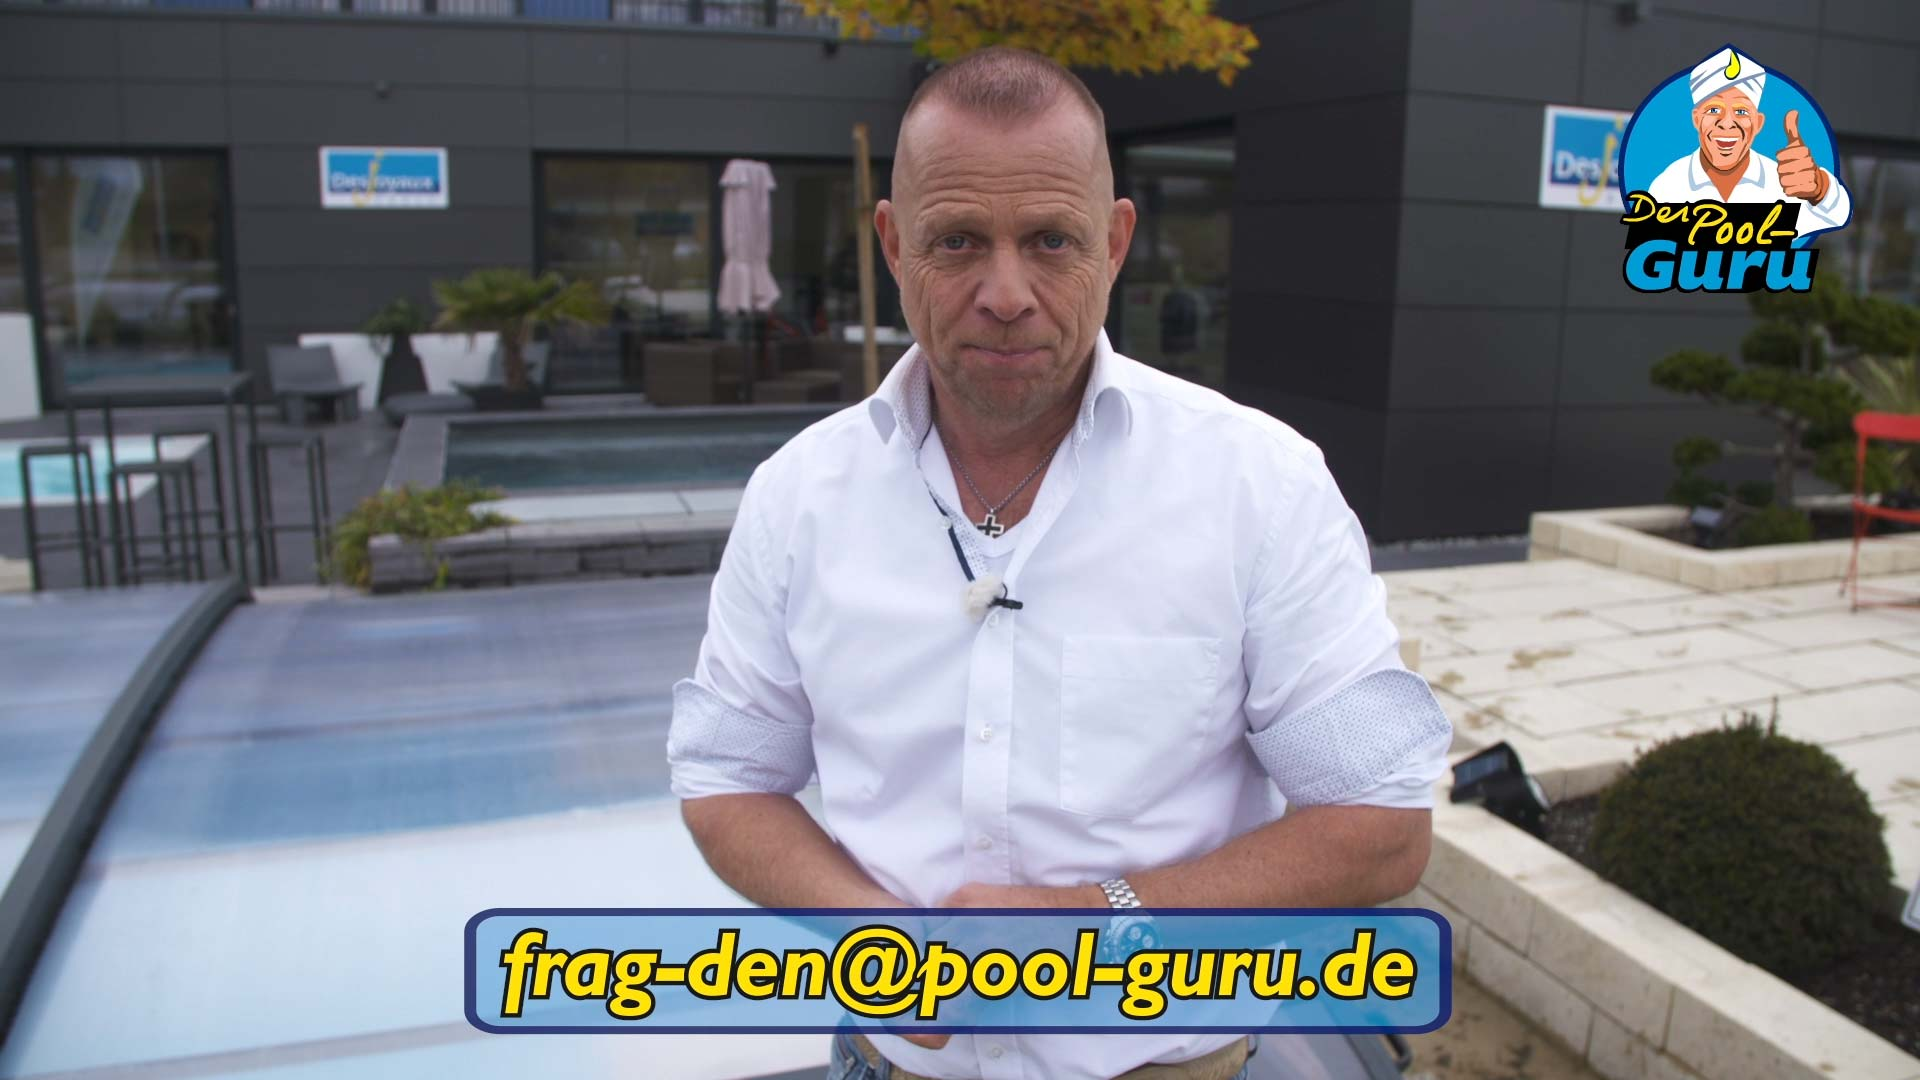 Frage an Pool Guru stellen